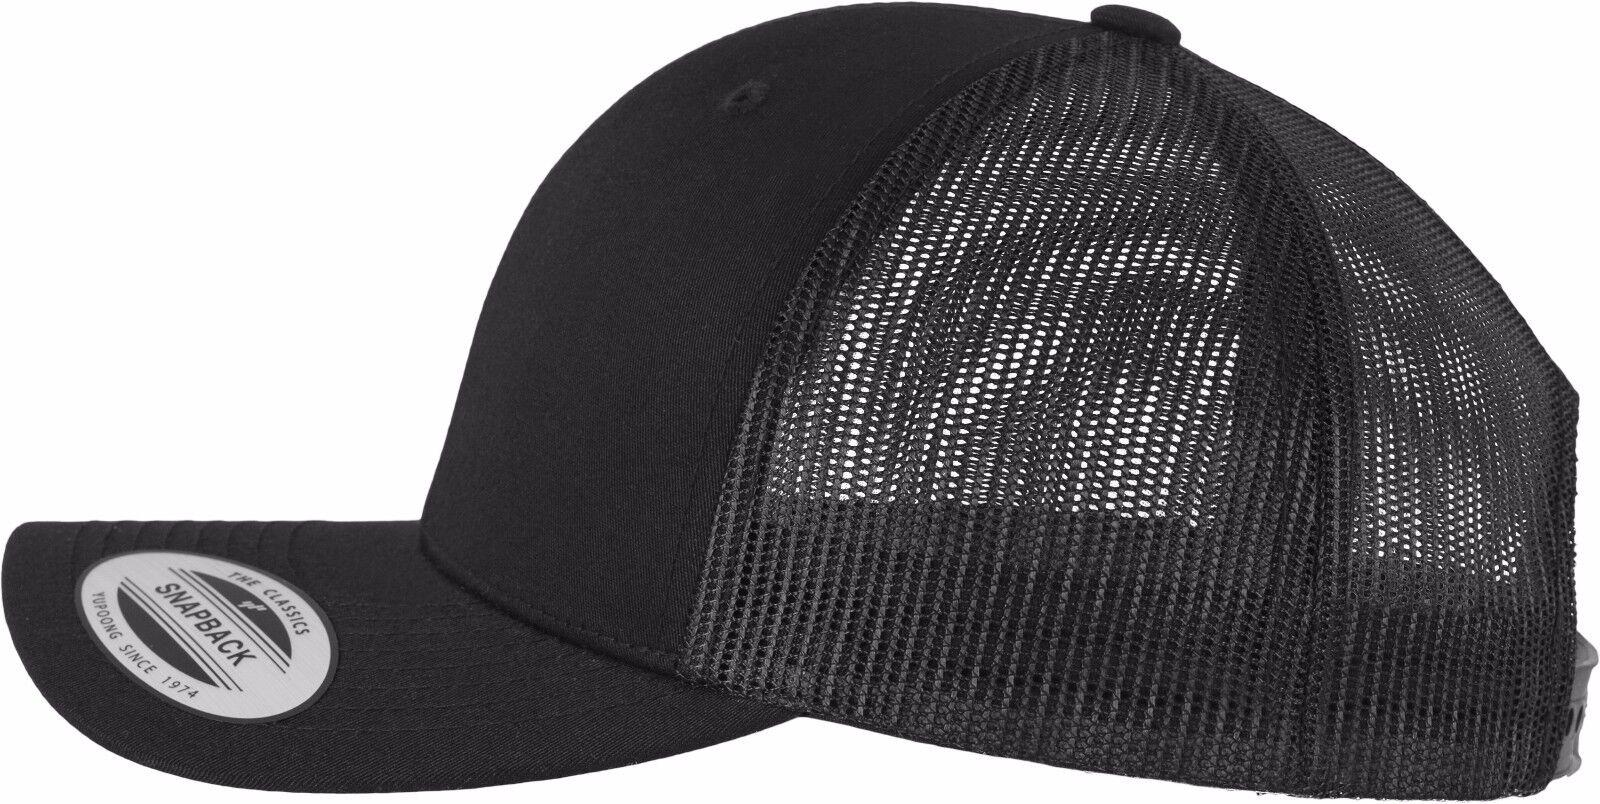 USS ENTERPRISE CVN-65 SHIP MESH TRUCKER SNAP CLOSURE CAP HAT RETRO BLACK RETRO HAT ec07b0